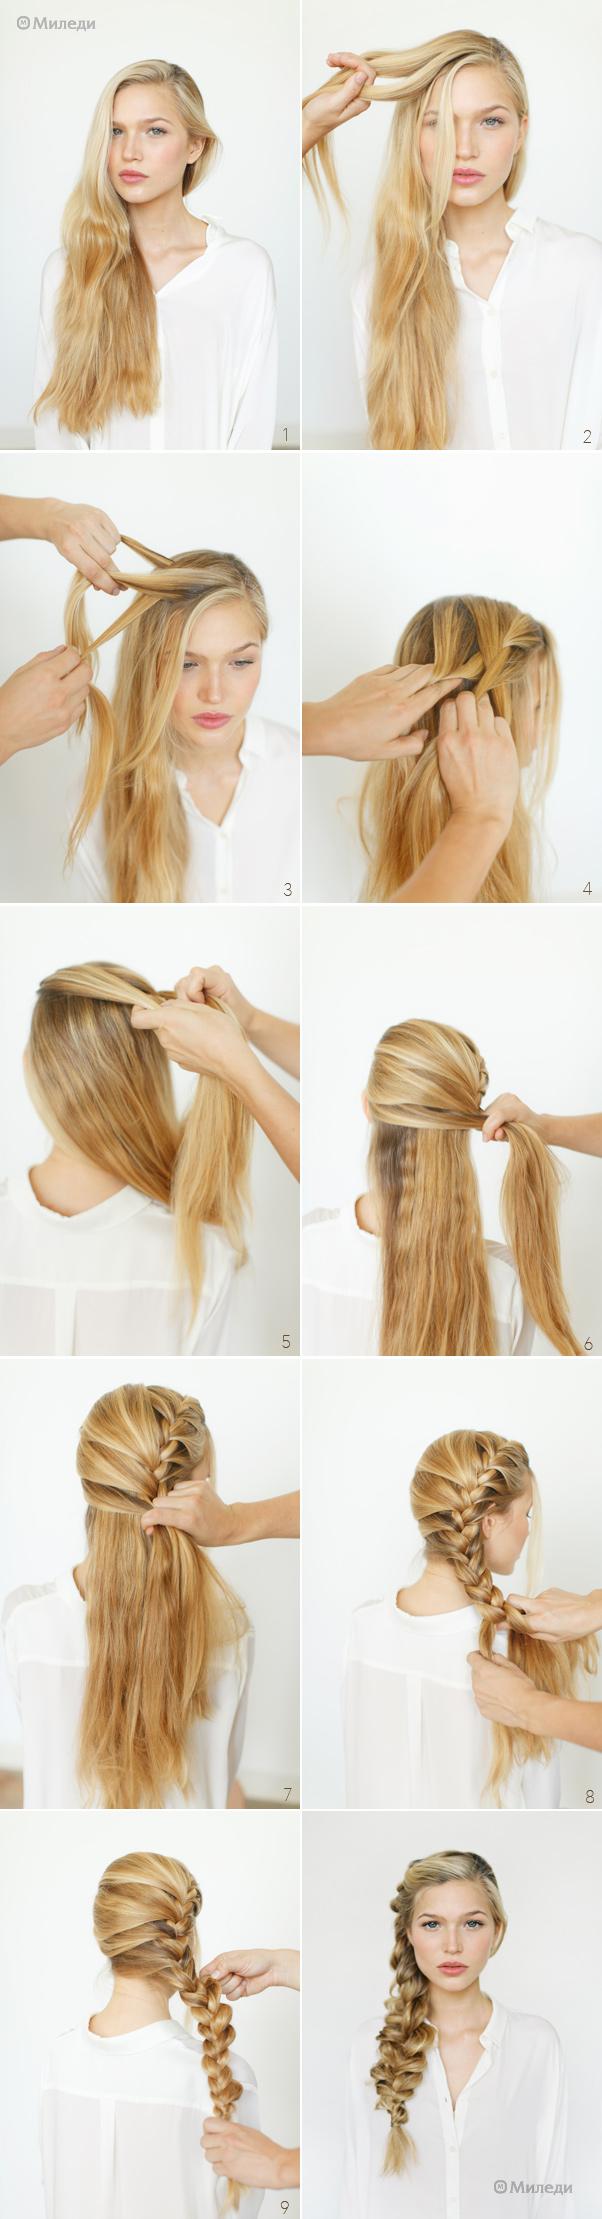 Французская коса как плести